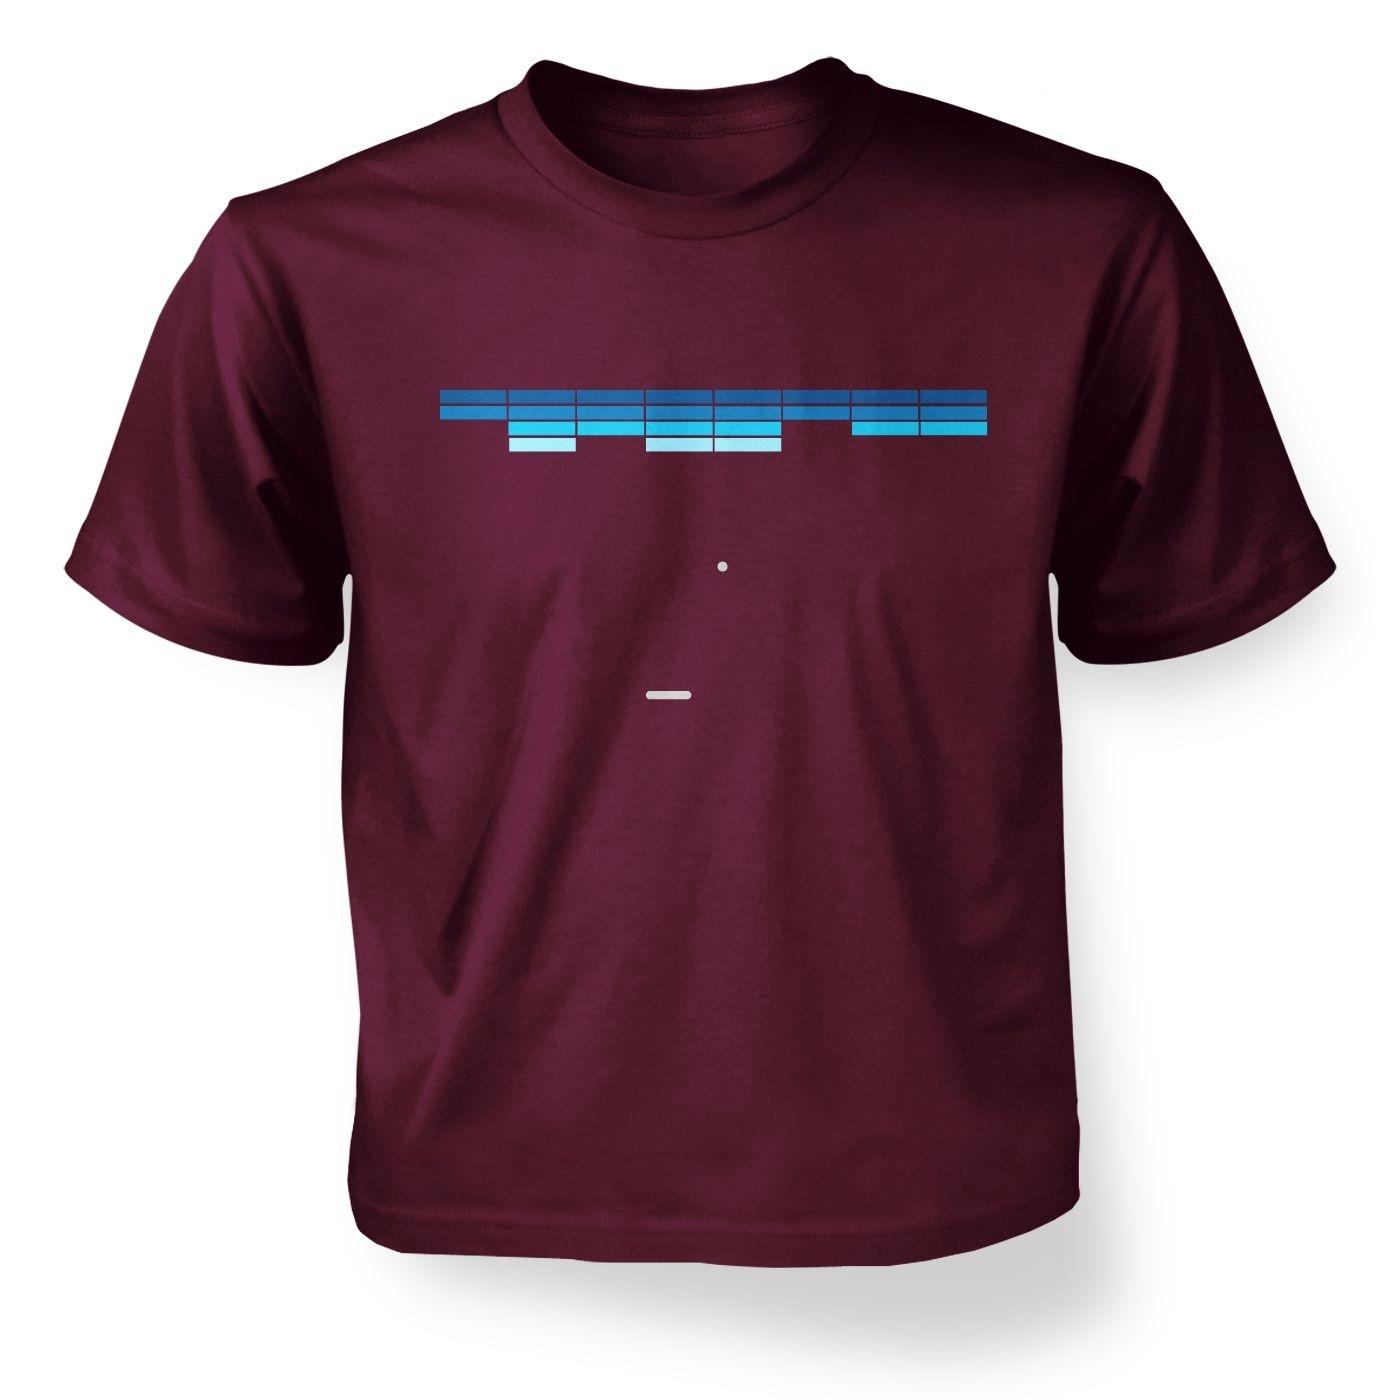 Retro Arcade Style (purple/blue) kids' t-shirt